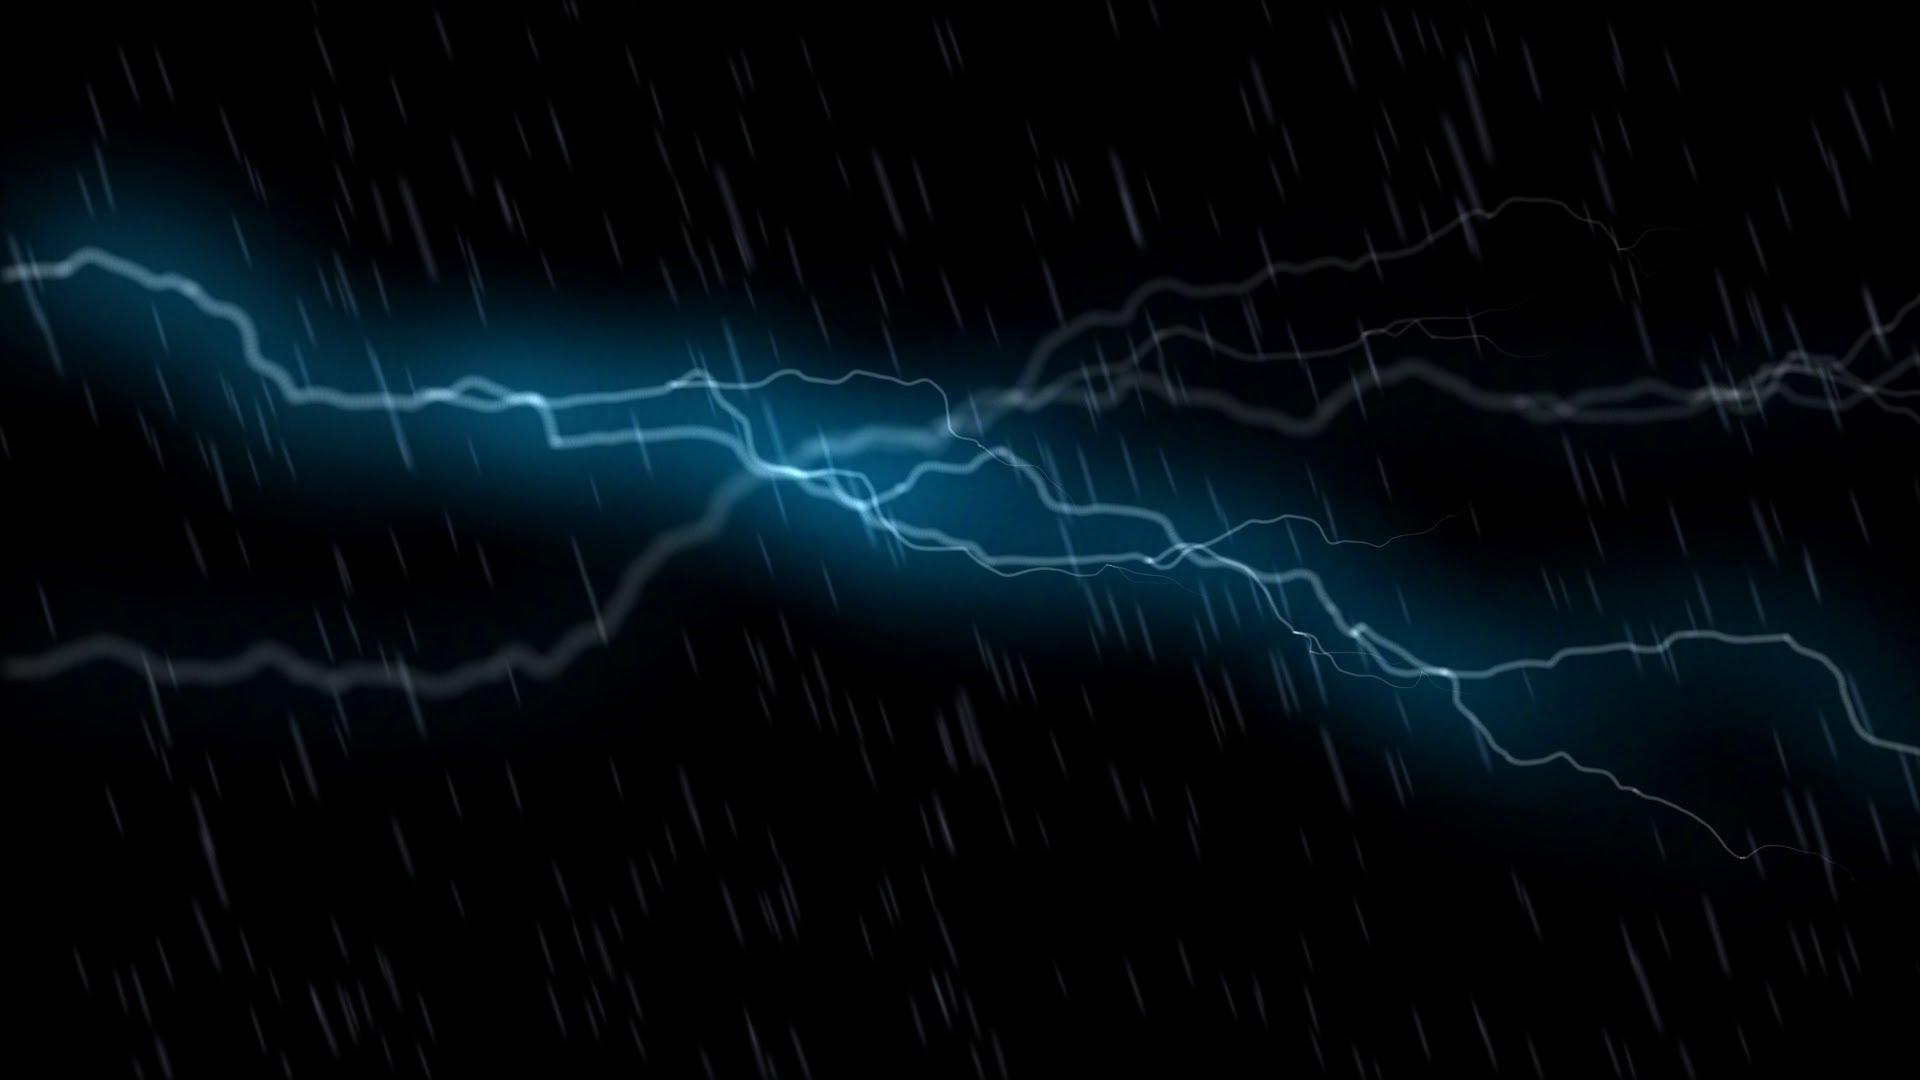 Thunder clipart animated Footage Animation Thunder and